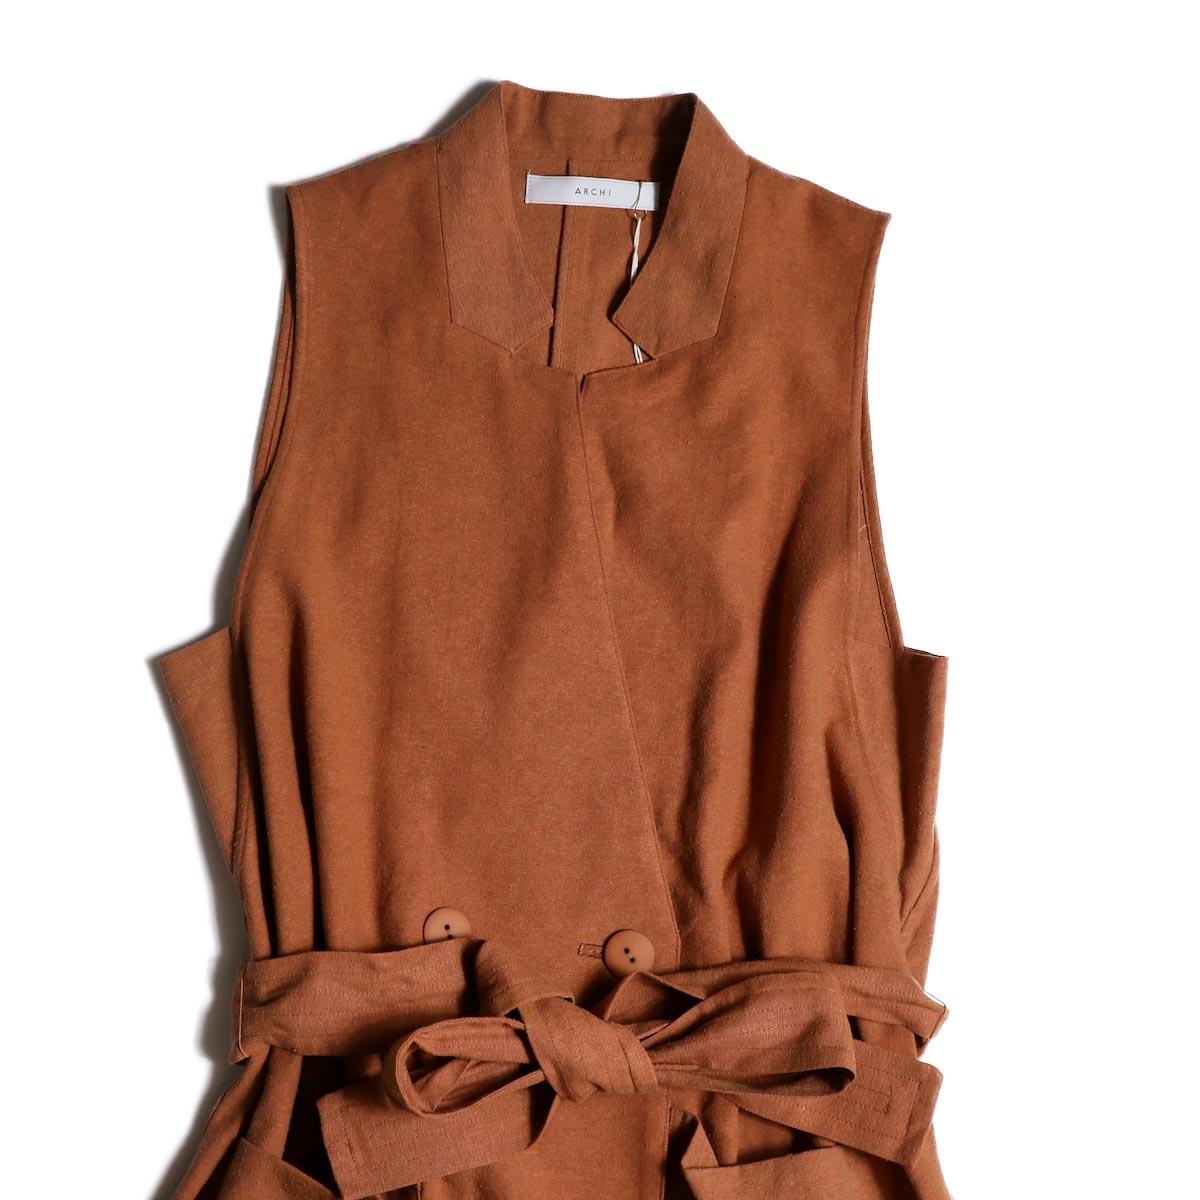 archi / Robinia Jacket (Terracotta)上半身